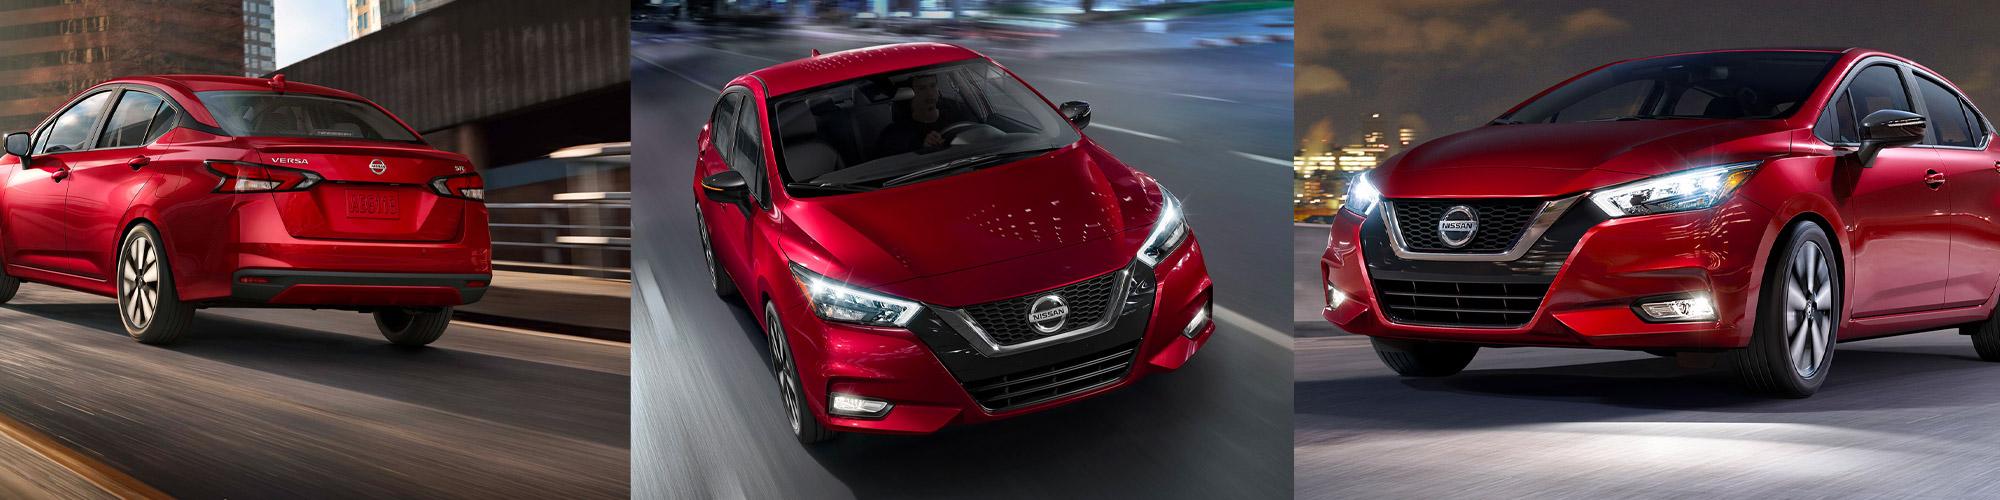 2020 Nissan Versa price